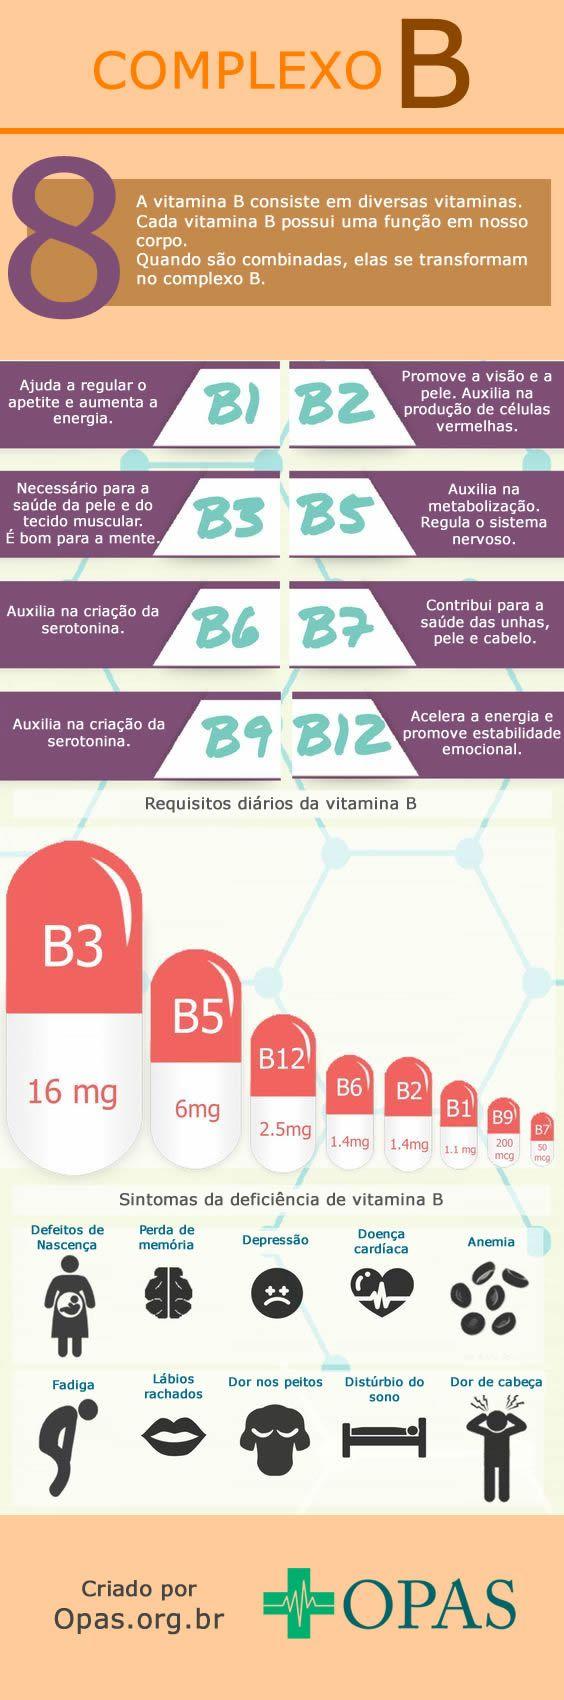 #Complexo das #vitaminaB  #govegan #vegano #vegetariano  #basefitness